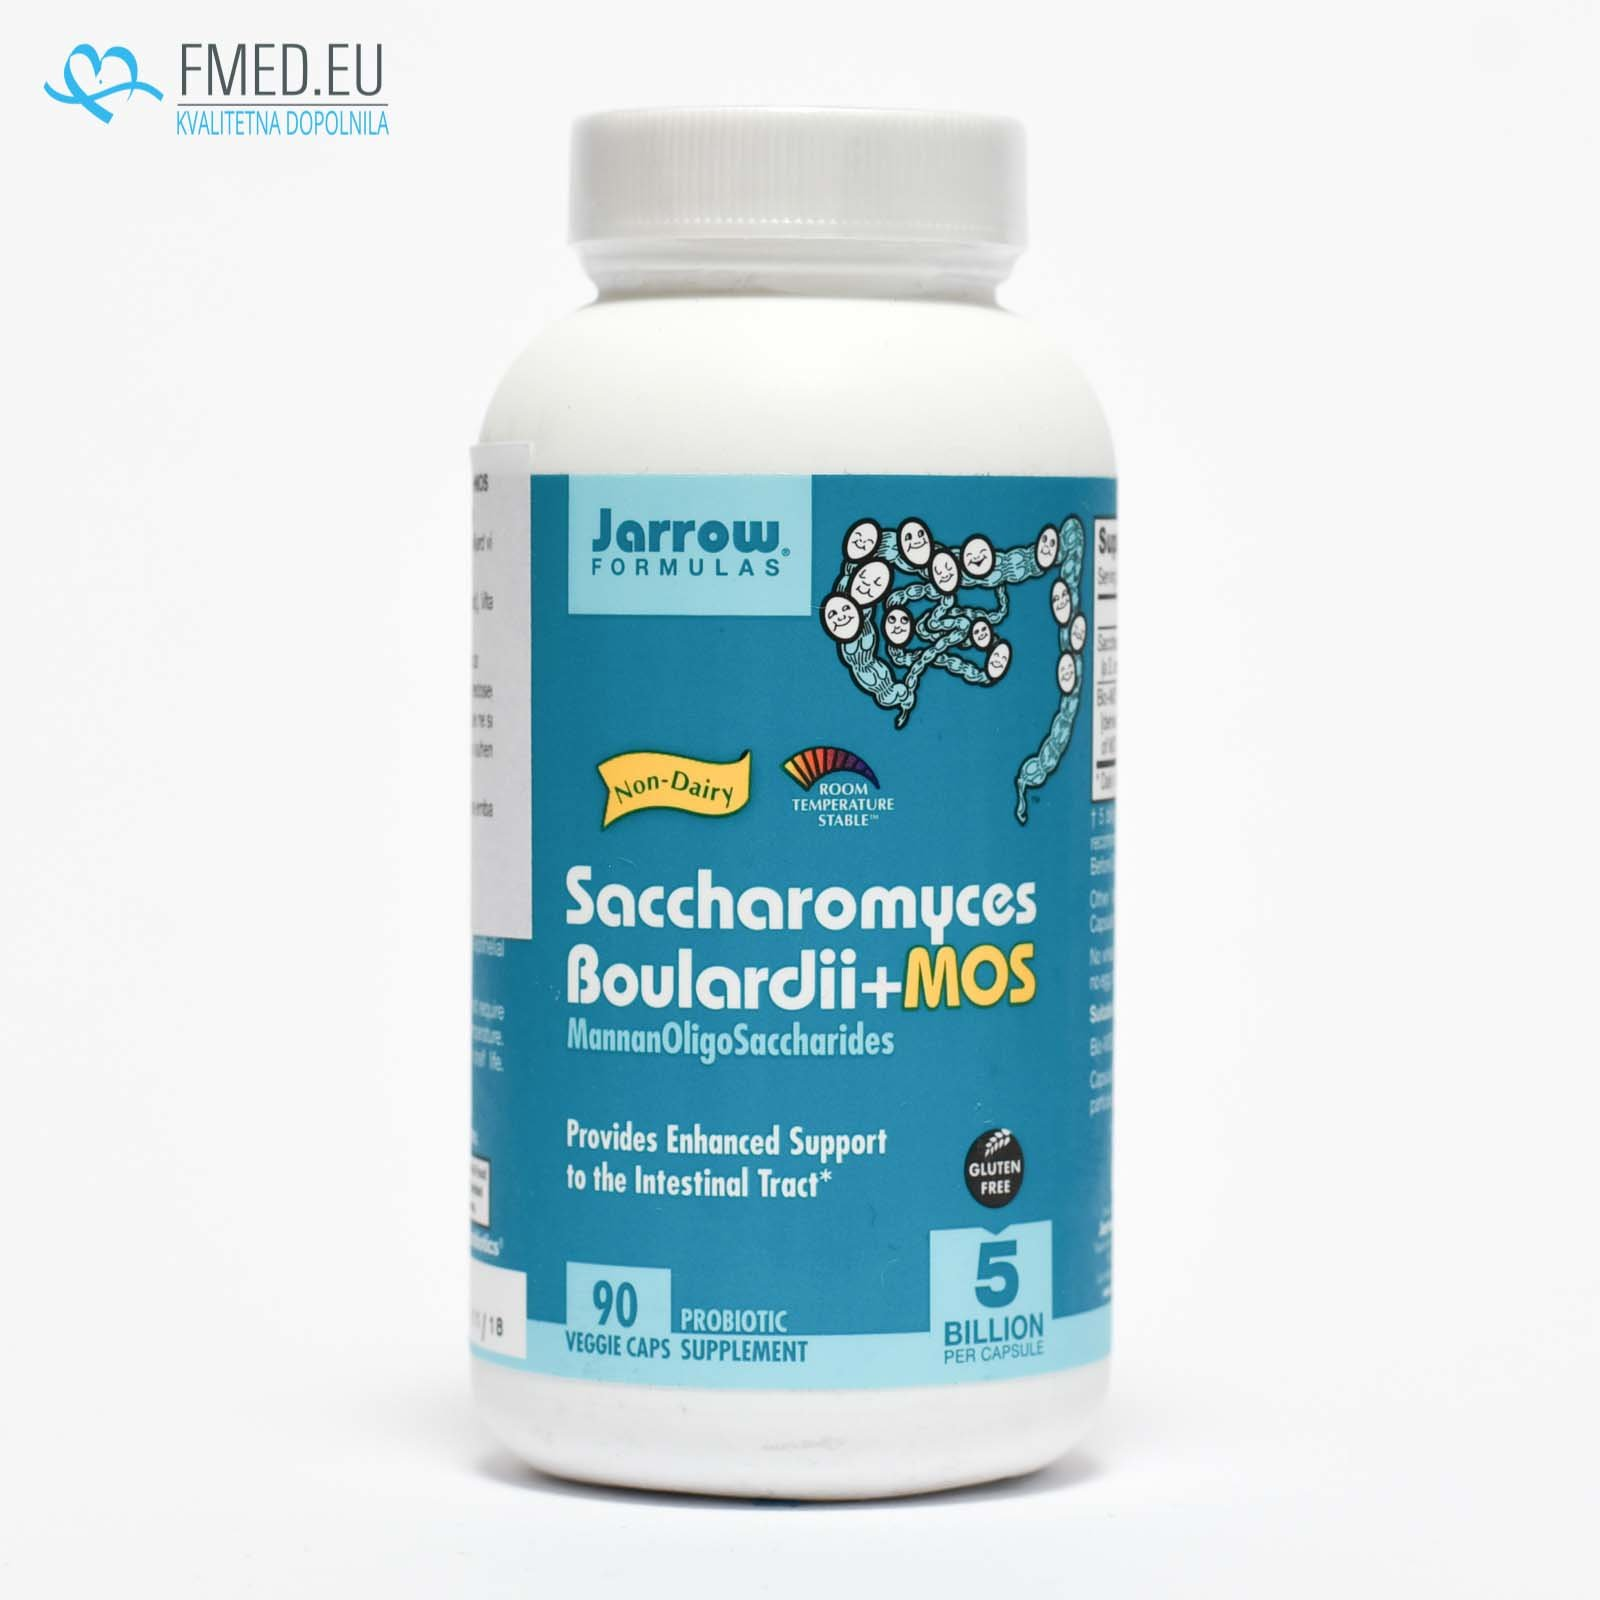 saccharomyces boulardii sverige